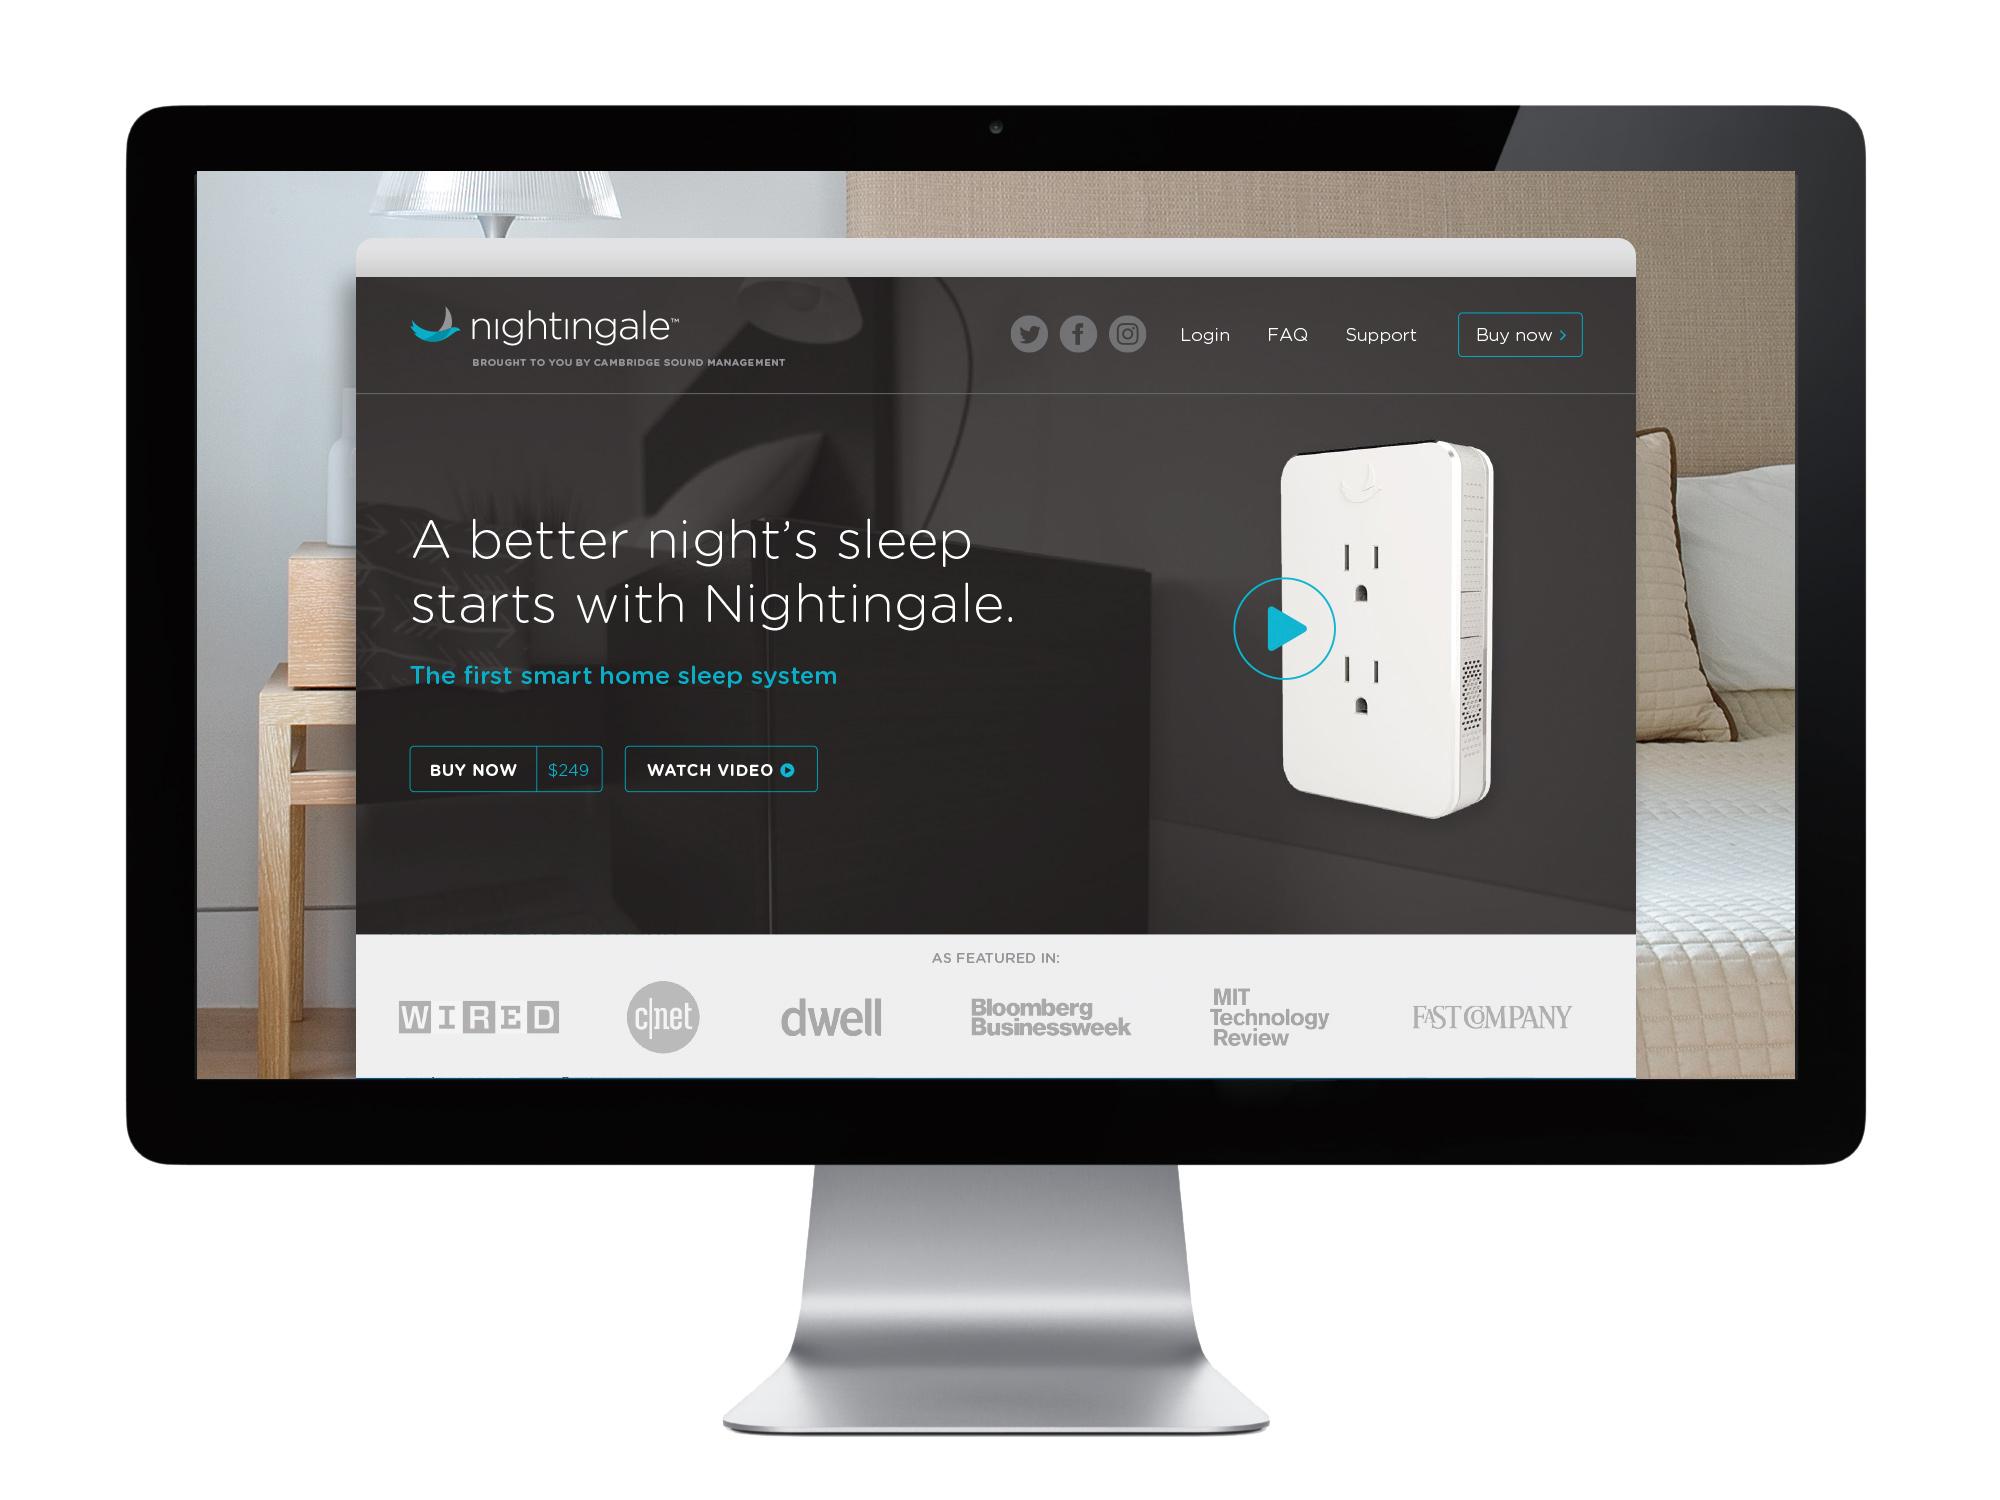 Nightingale Web Display